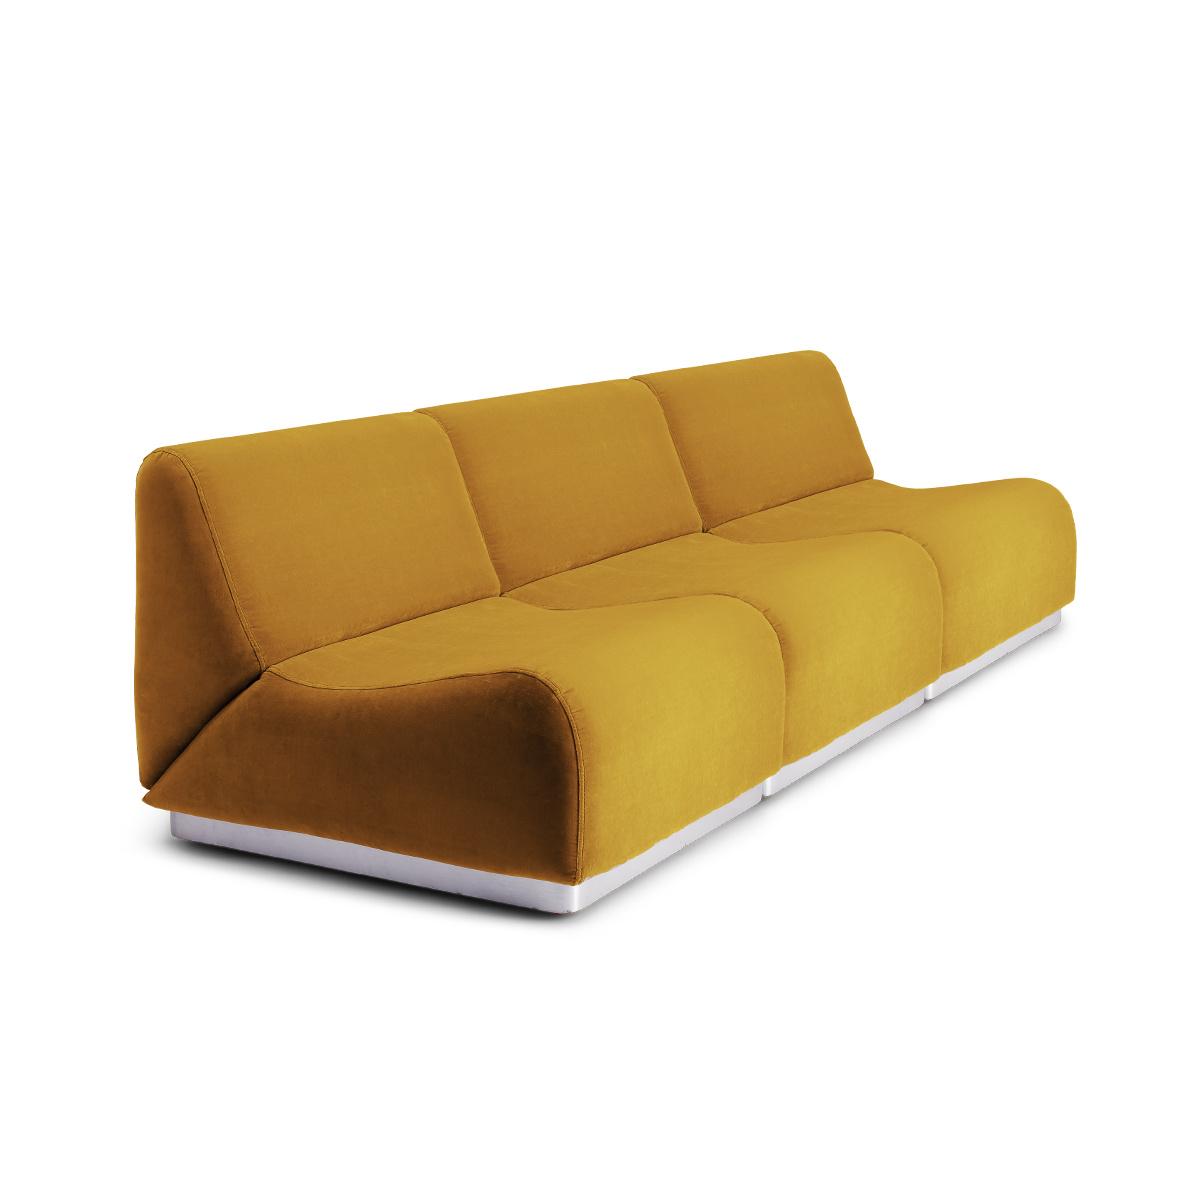 Rotondo Modular Sofa in Mustard Velvet